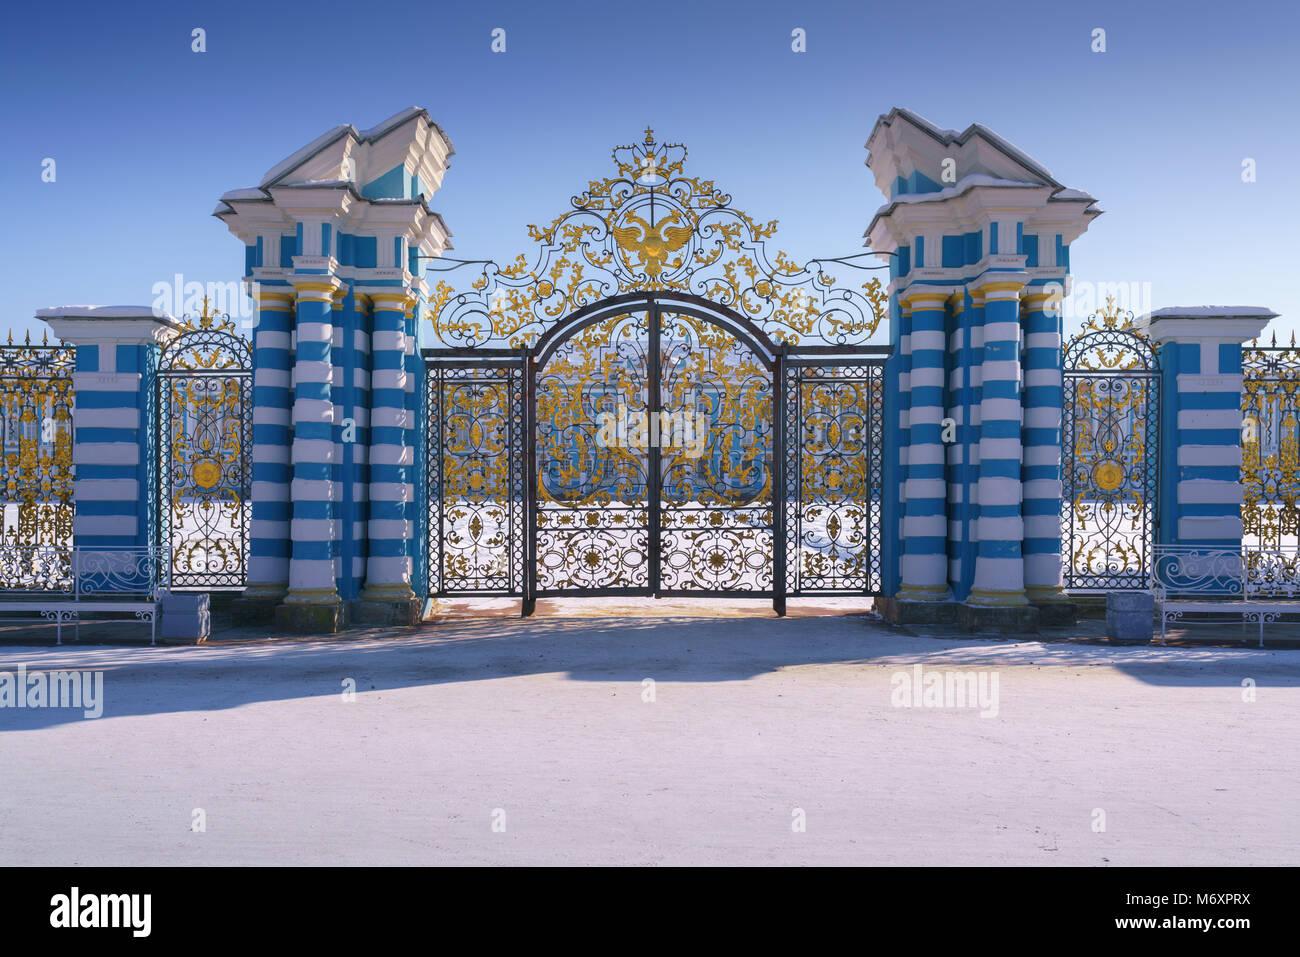 Golden gate in The Catherine Palace, Tsarskoye Selo, Pushkin, Saint-Petersburg, Russia - Stock Image